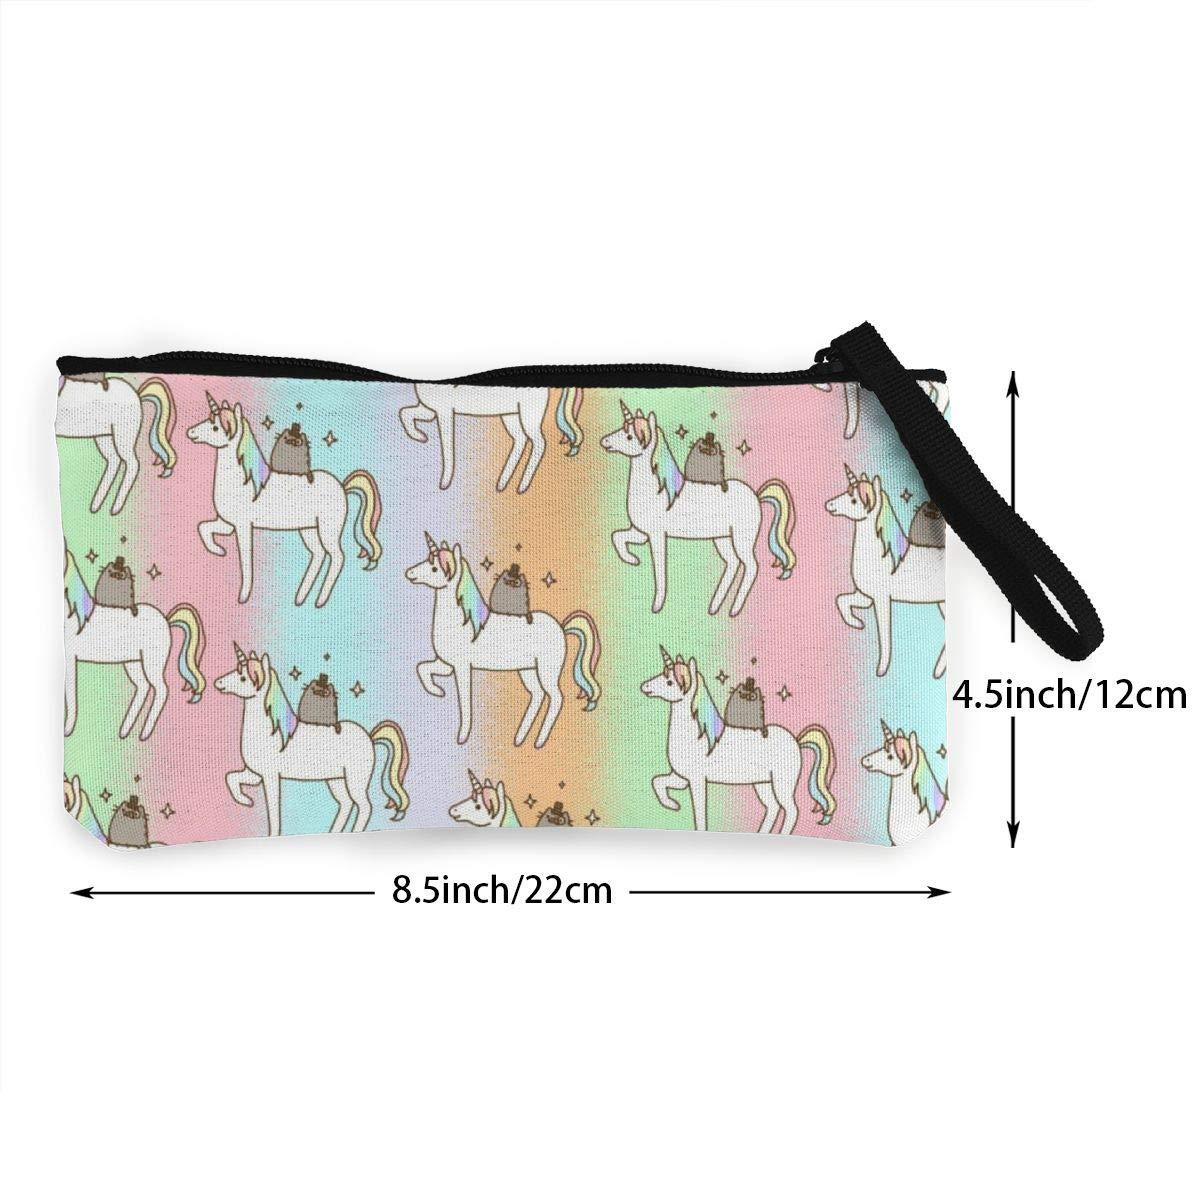 Push-een Cat Zipper Coin Purse Canvas Wallet Bag Change Purse Pouch Key Holder With Strap